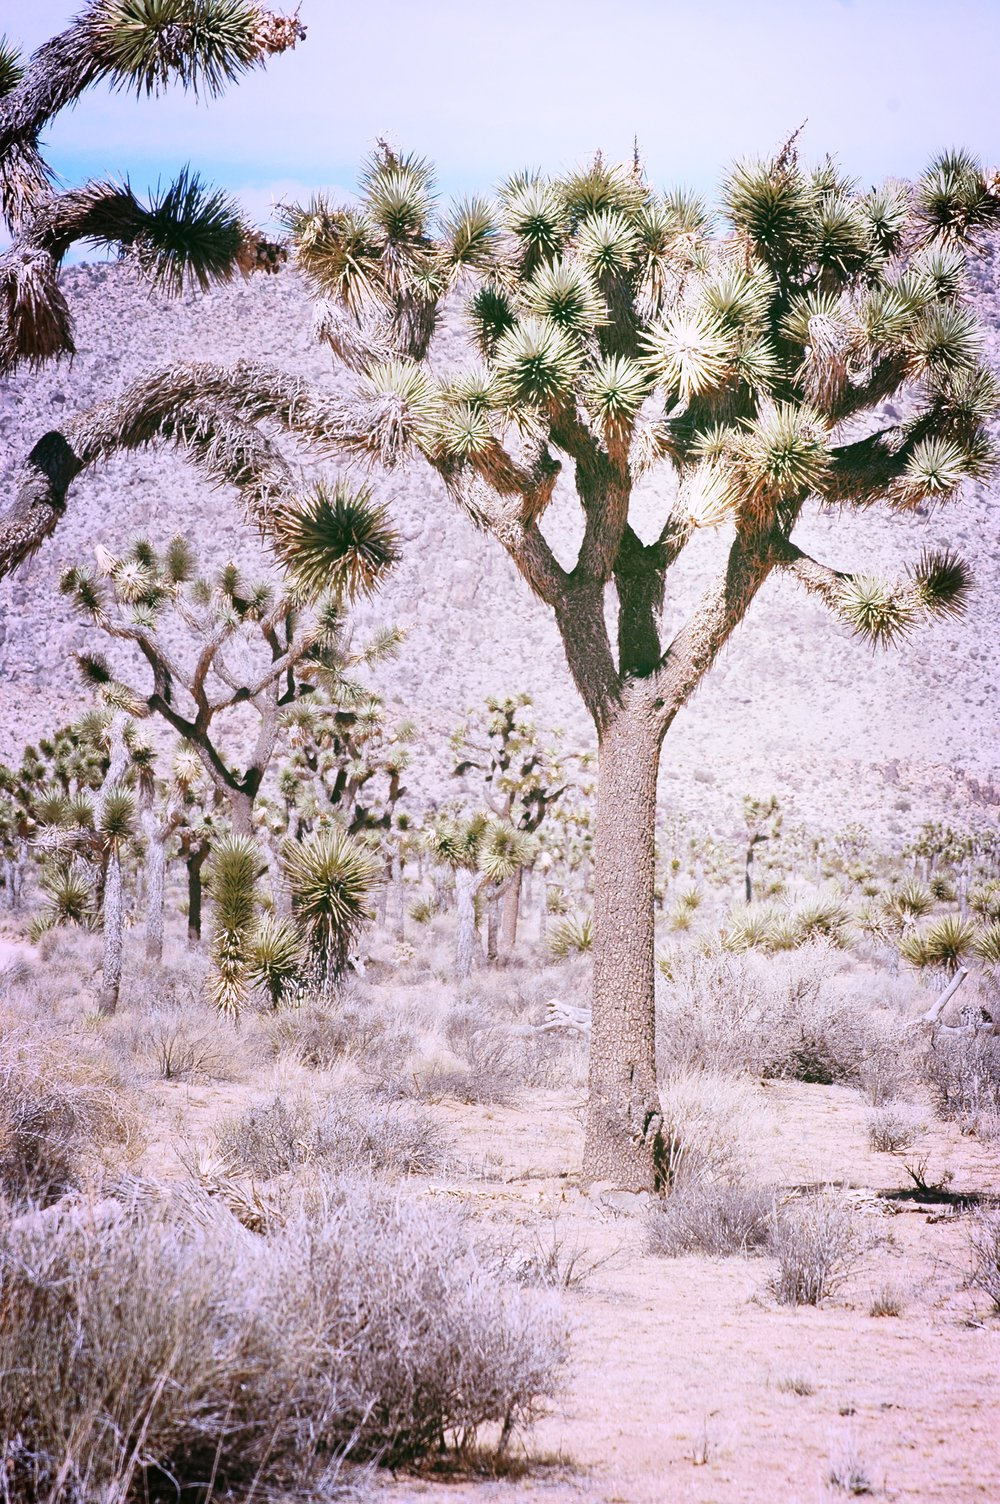 Joshua Tree Forest